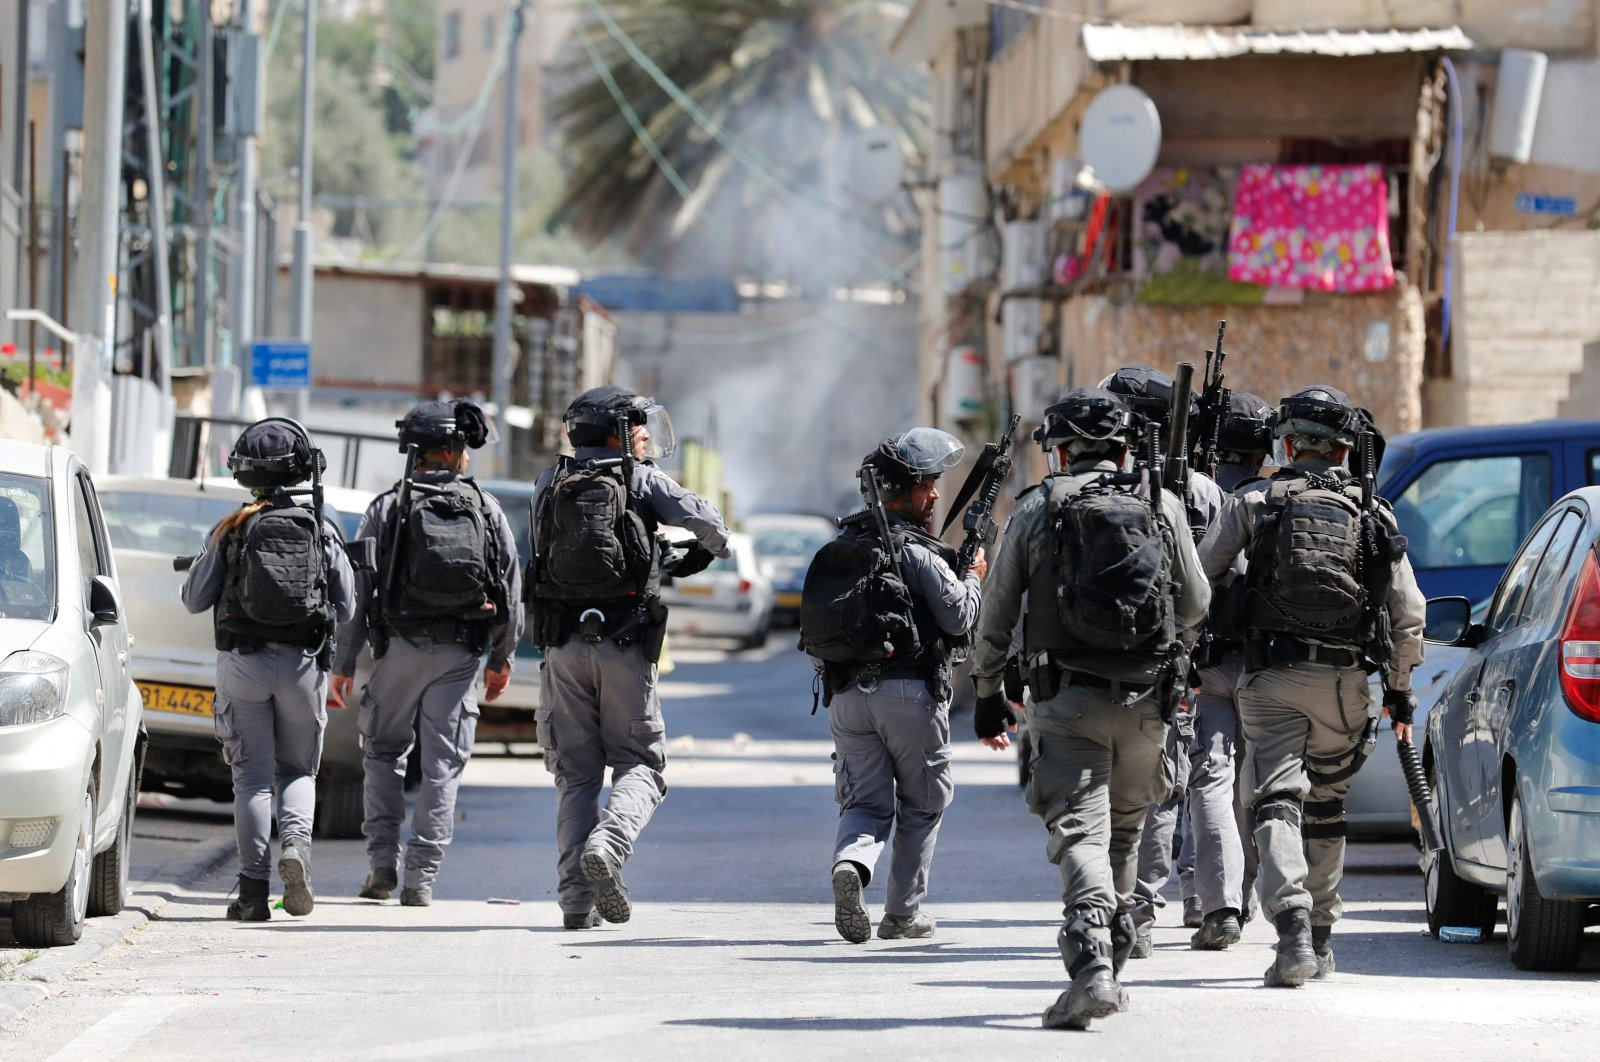 Israeli security officers fire tear gas at Palestinian residents as Israeli authorities demolish shops in Israeli-annexed East Jerusalem's predominantly Arab neighborhood of Silwan, occupied Palestine, June 29, 2021. (AFP Photo)